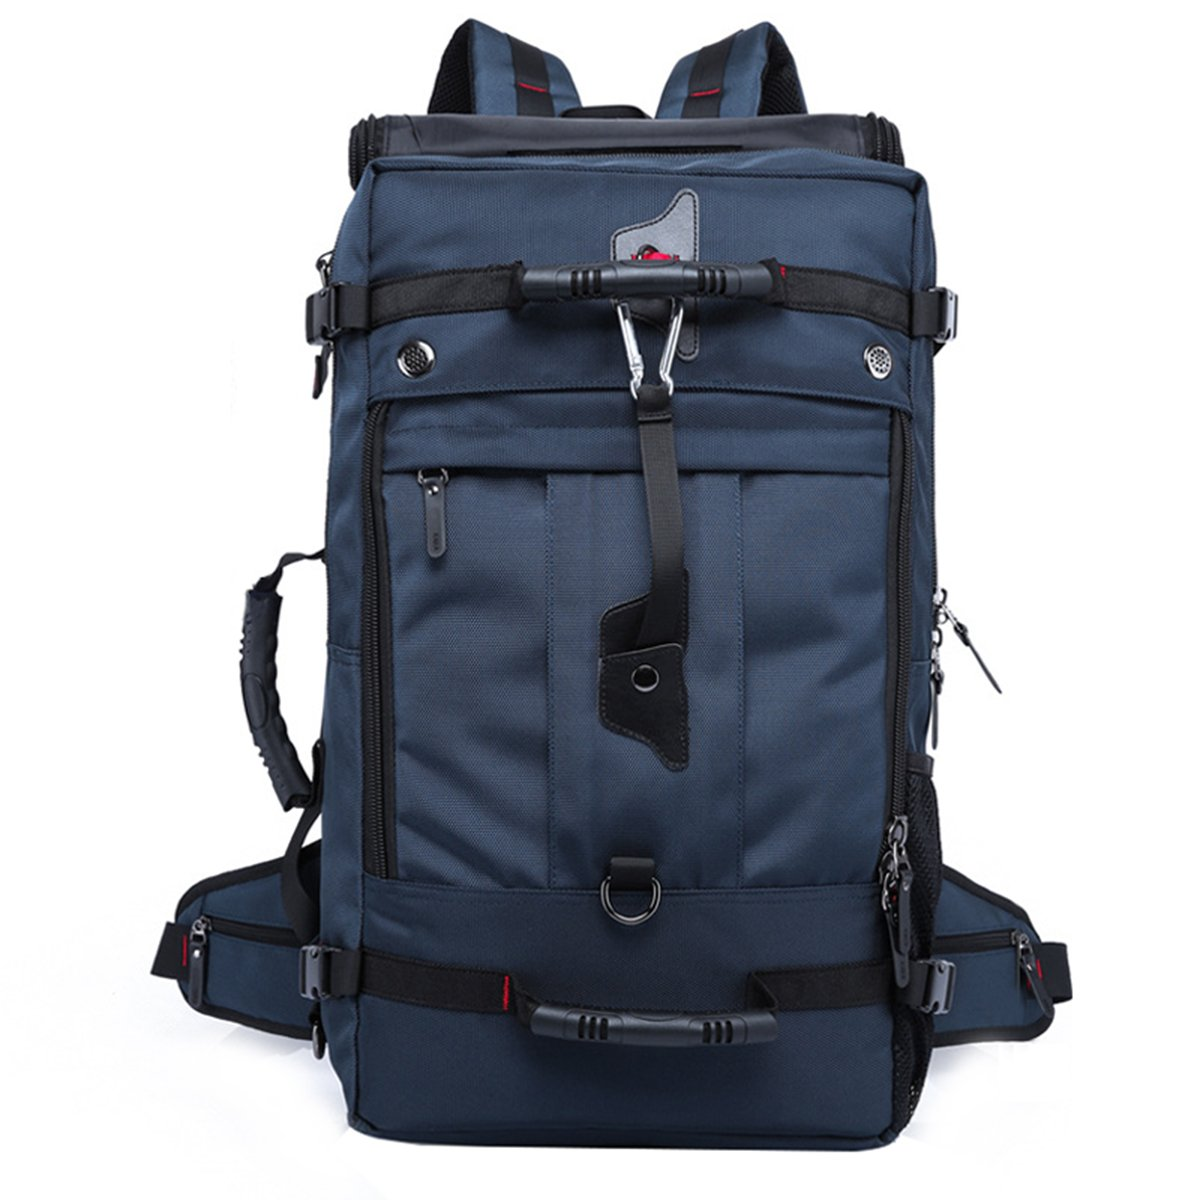 Fanspack ザック アウトドア バッグ 山登り リュック 登山 デイパック ネイビー メンズ レディース ポケット 50L 大型 パスワード ロック付き オックスフォード パスワード ロック付き B078MYJK2H  ネイビー